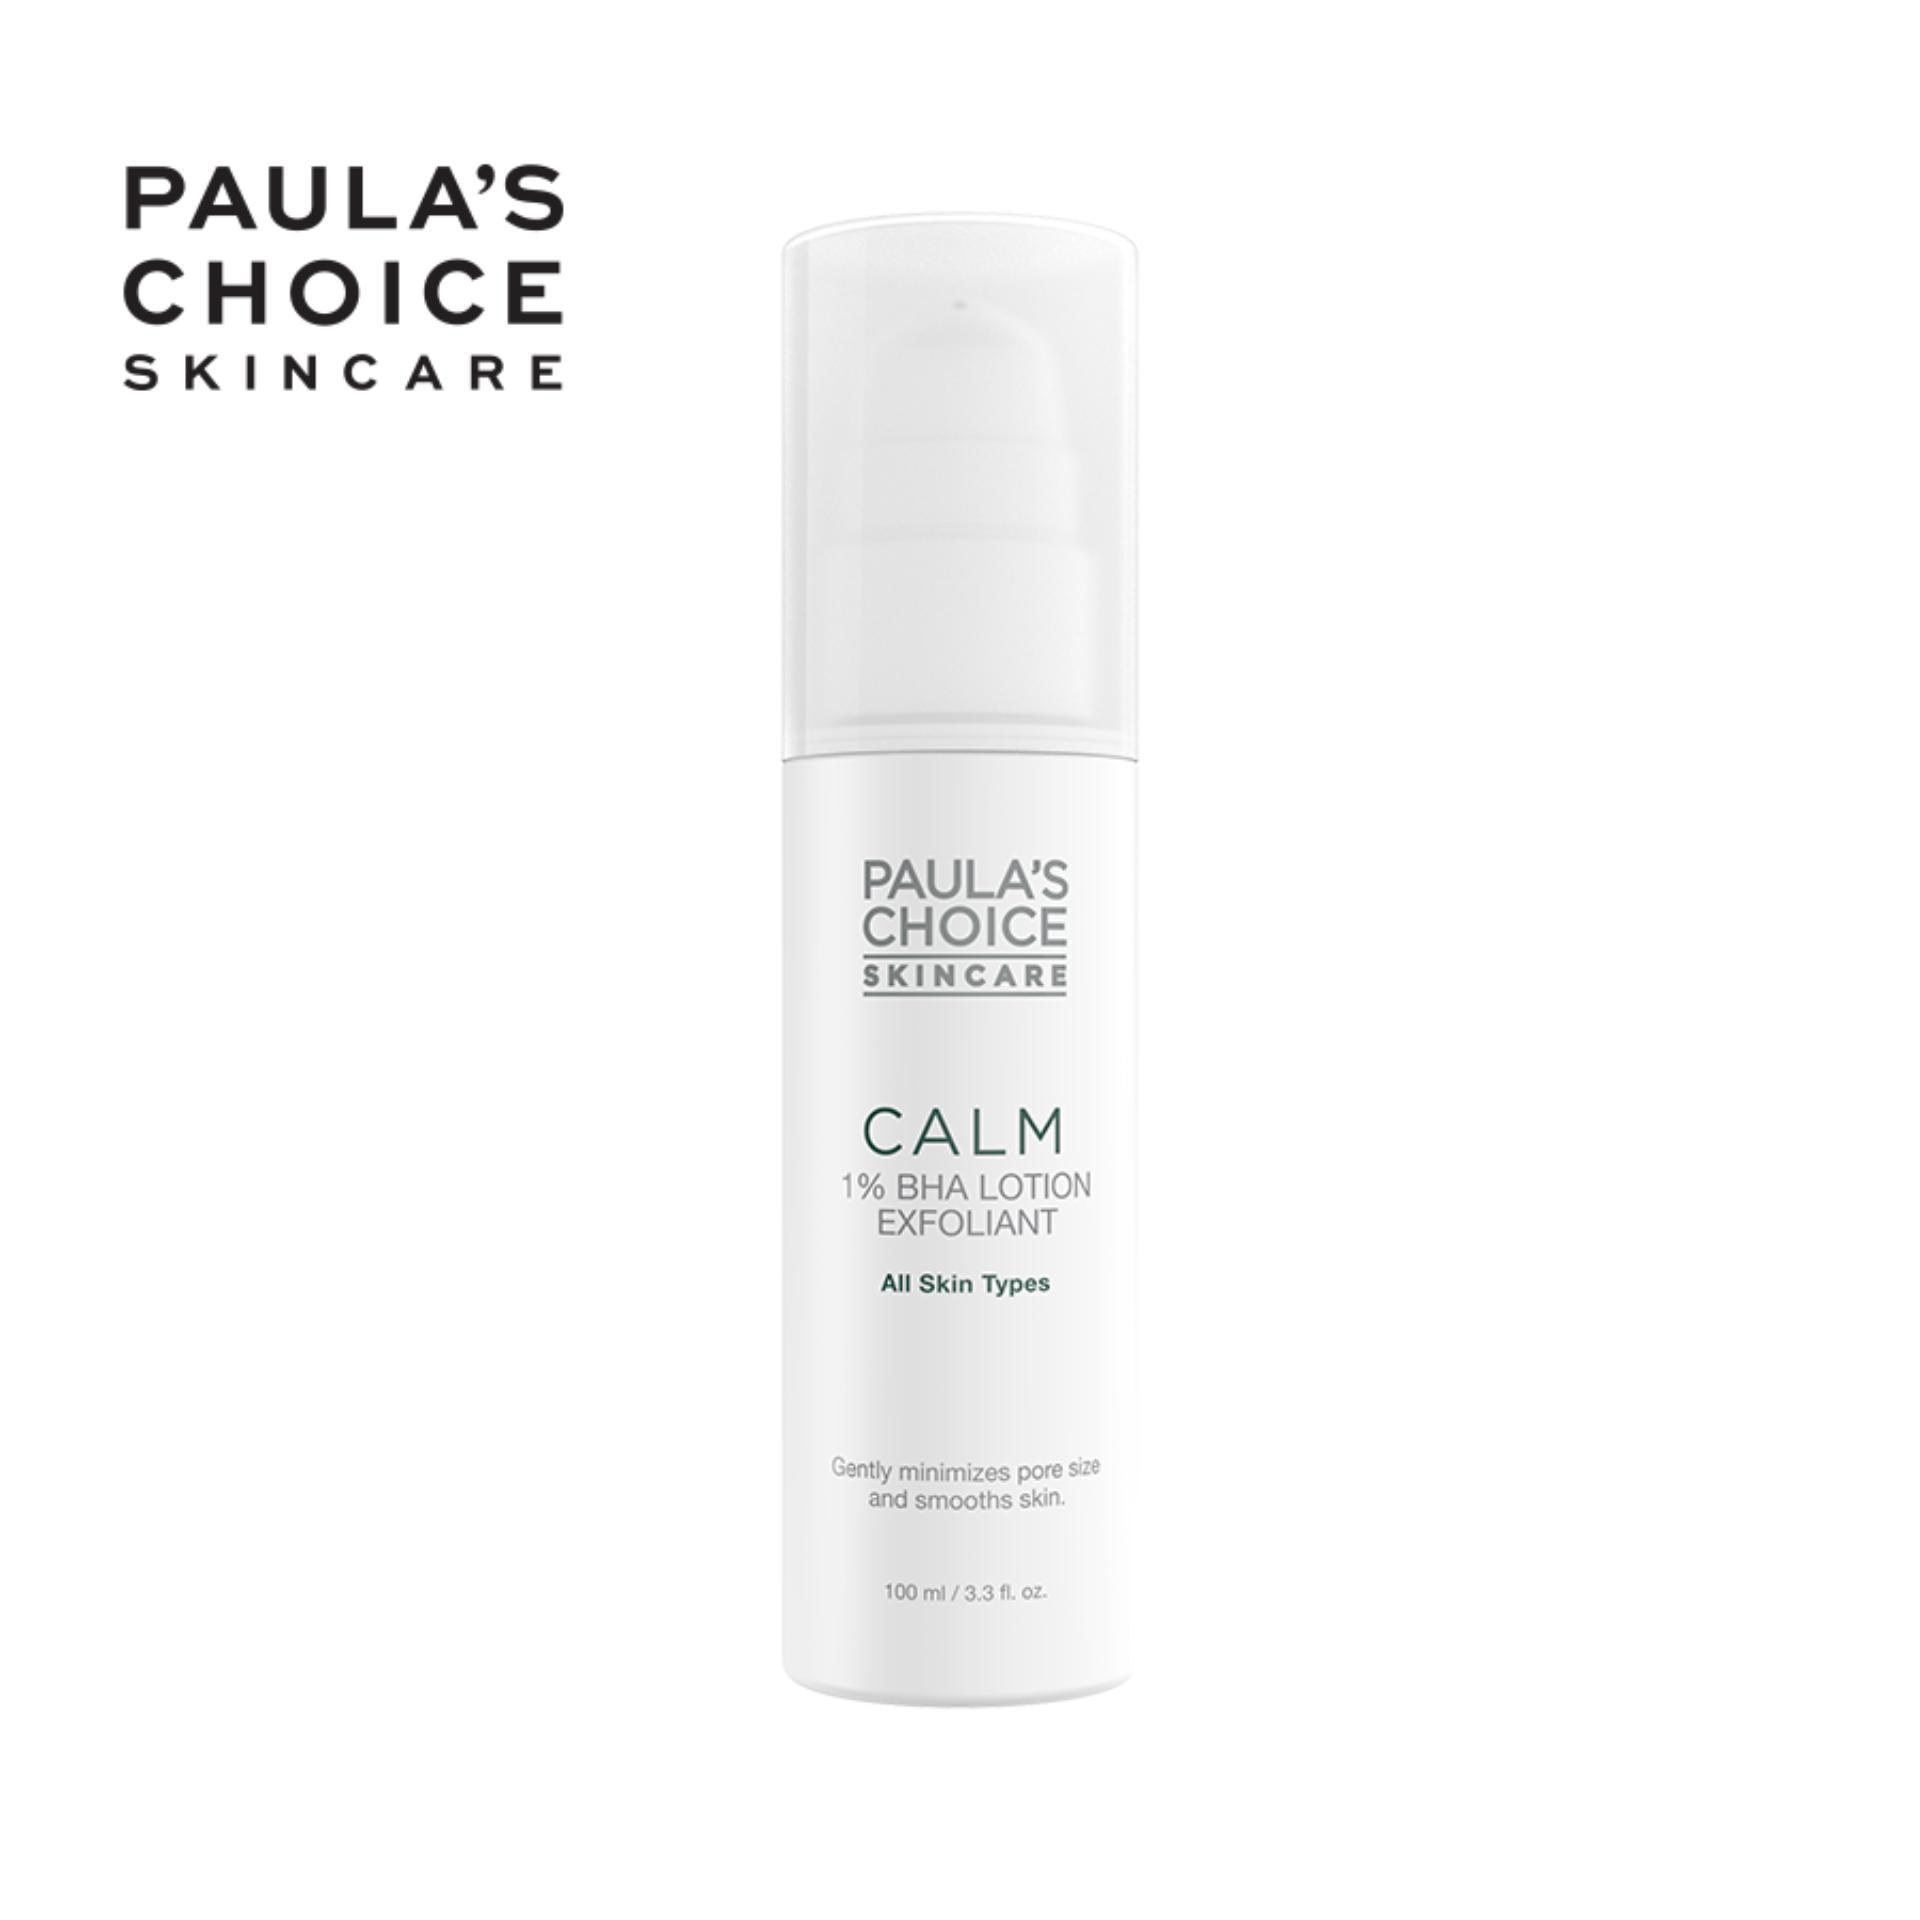 Loại bỏ tế bào chết dịu nhẹ Paula's Choice Calm Redness Relief 1% BHA Lotion Exfoliant 9100